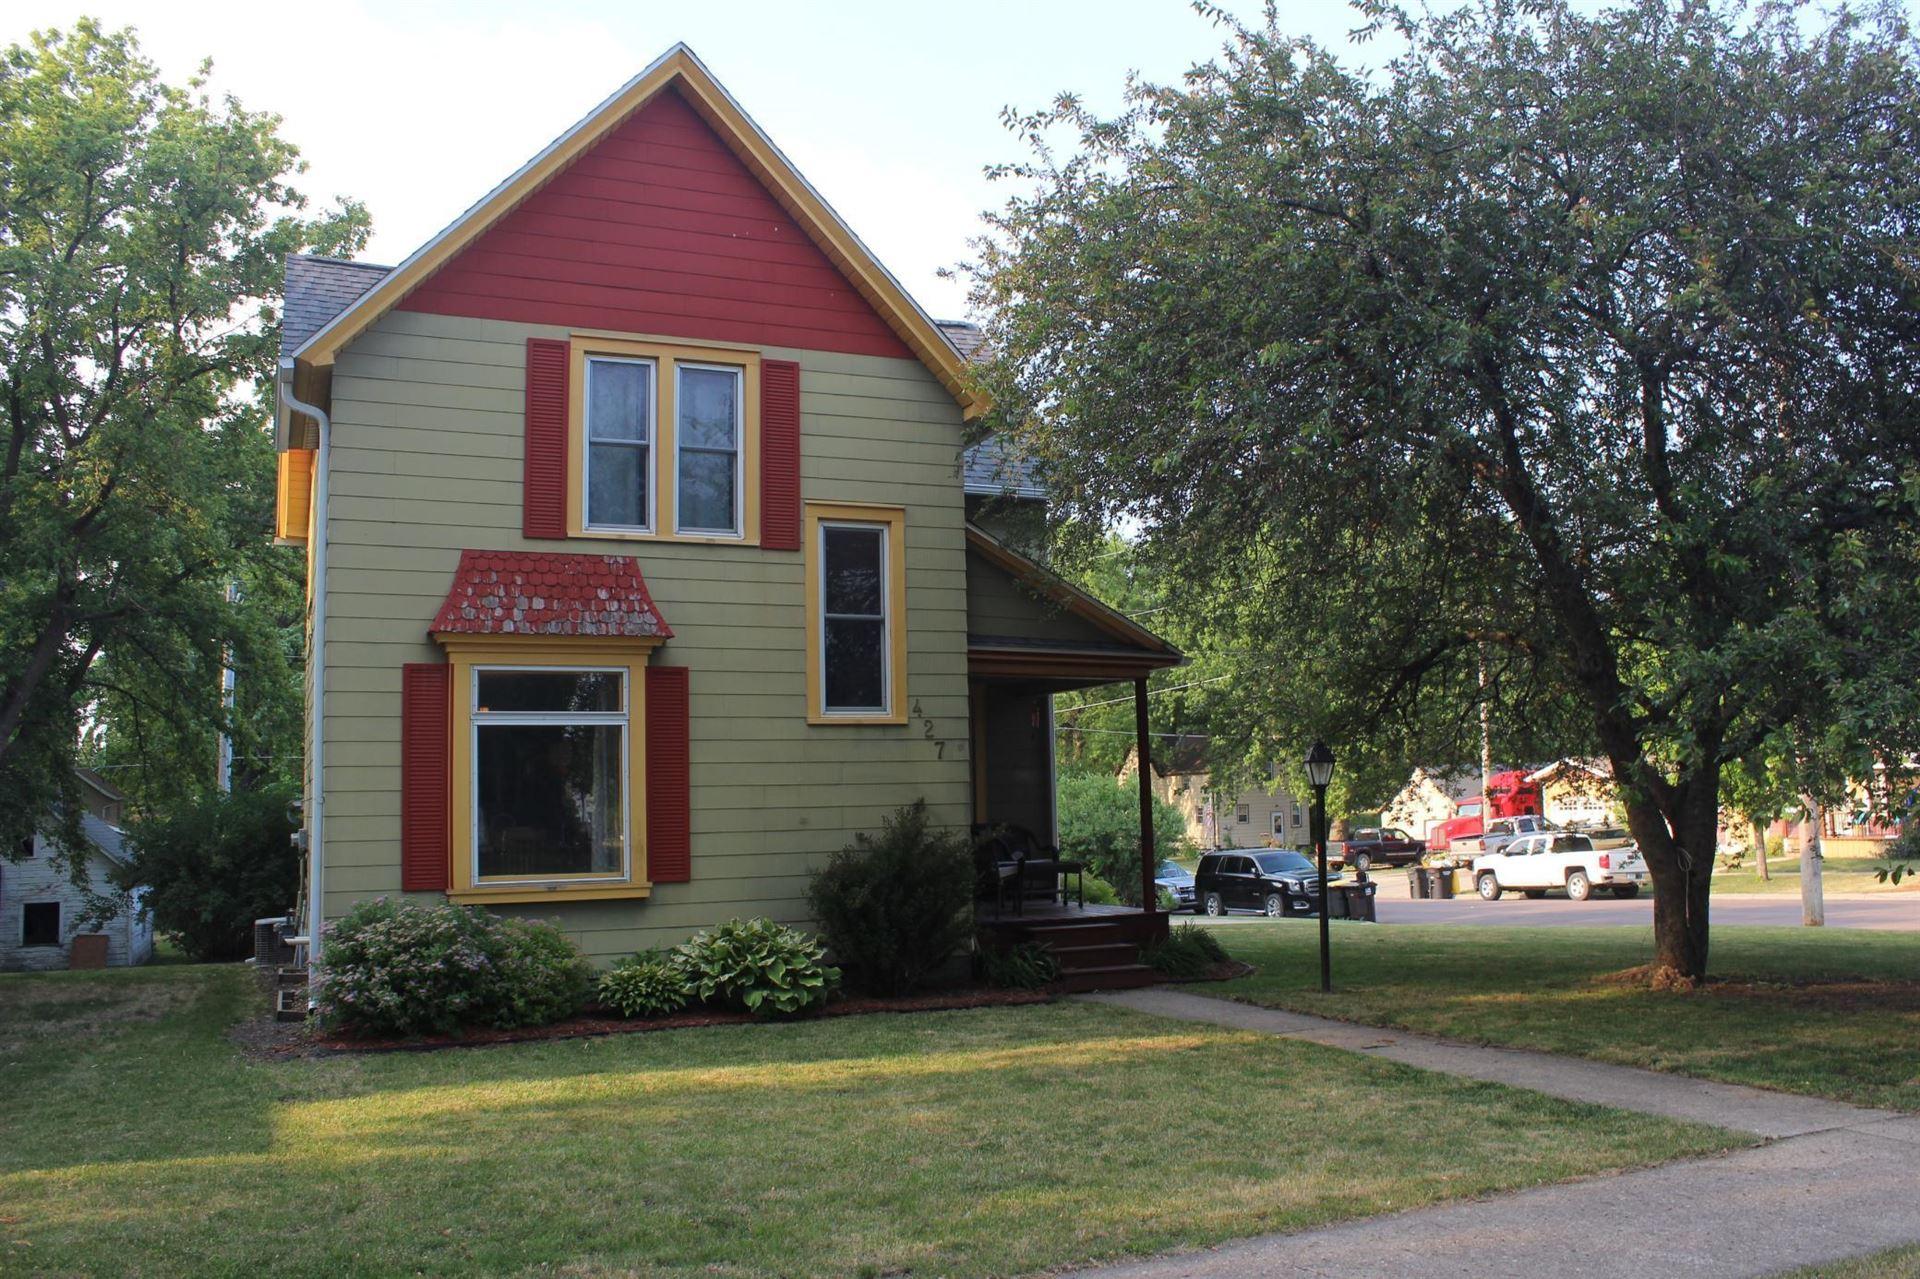 Photo of 427 E 9th Street, Blue Earth, MN 56013 (MLS # 6012448)